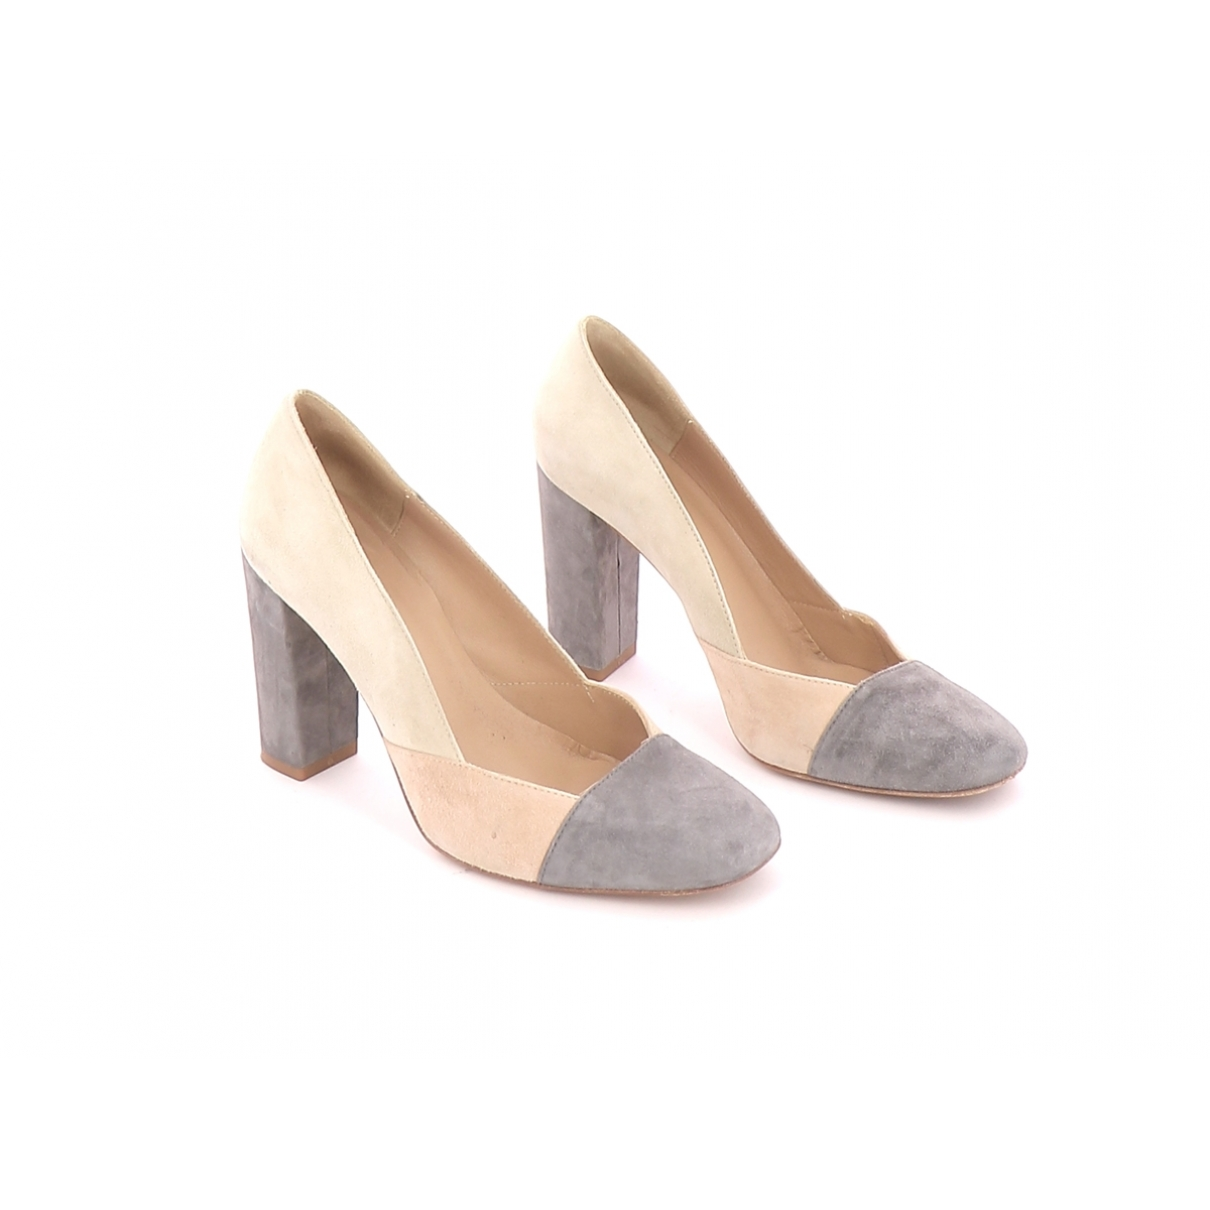 Balzac Paris \N Multicolour Leather Heels for Women 39 EU